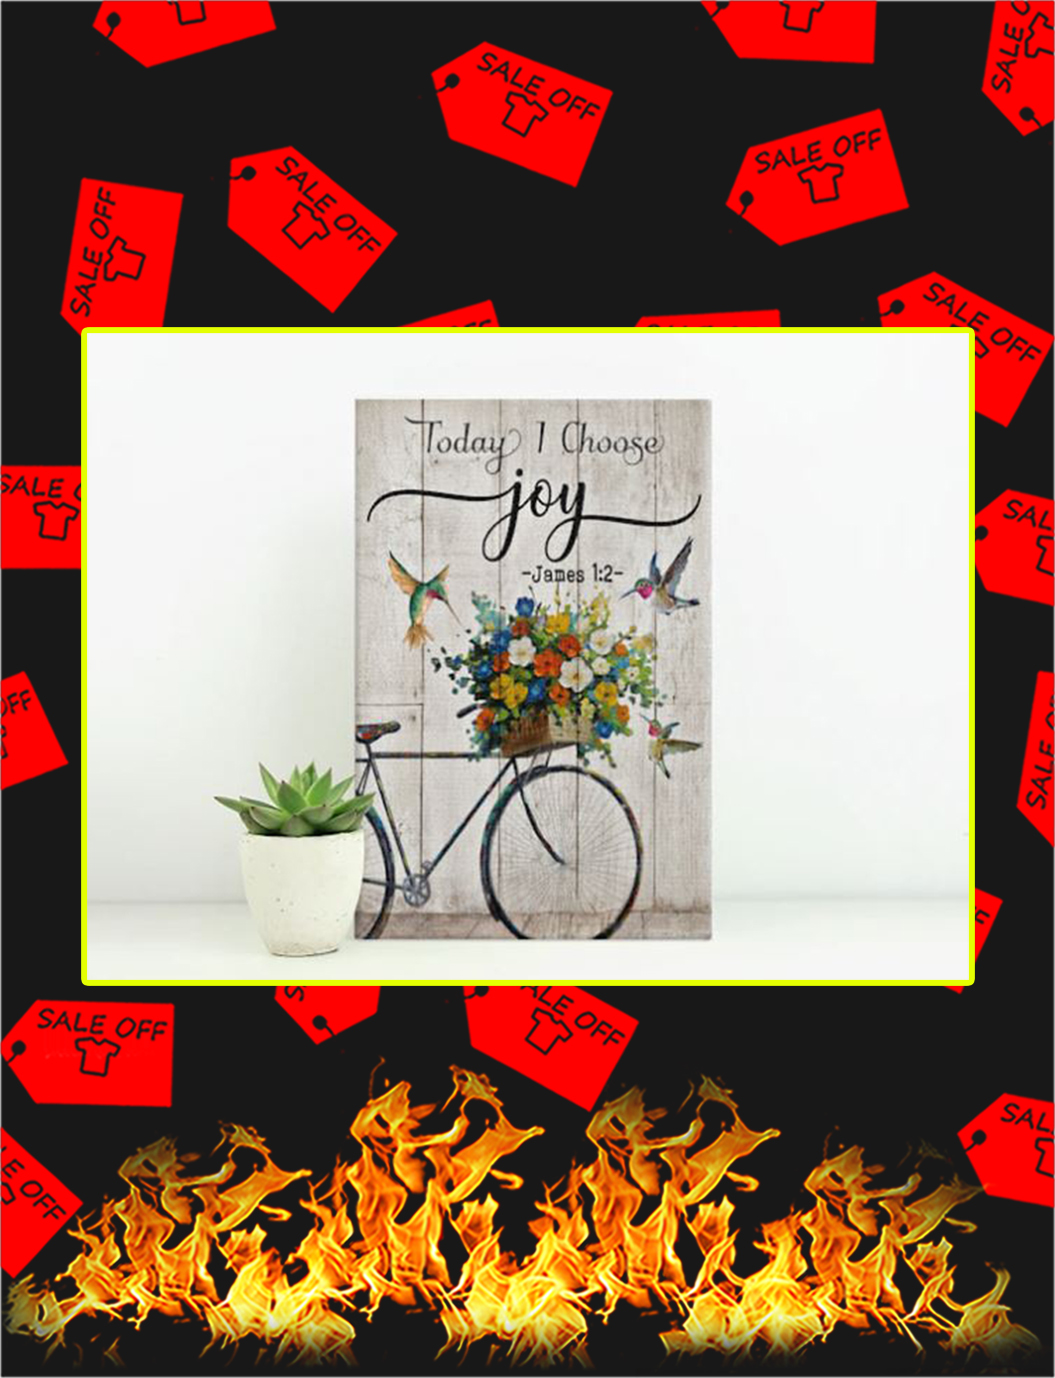 Hummingbird and Bike Today I choose joy canvas prints - medium